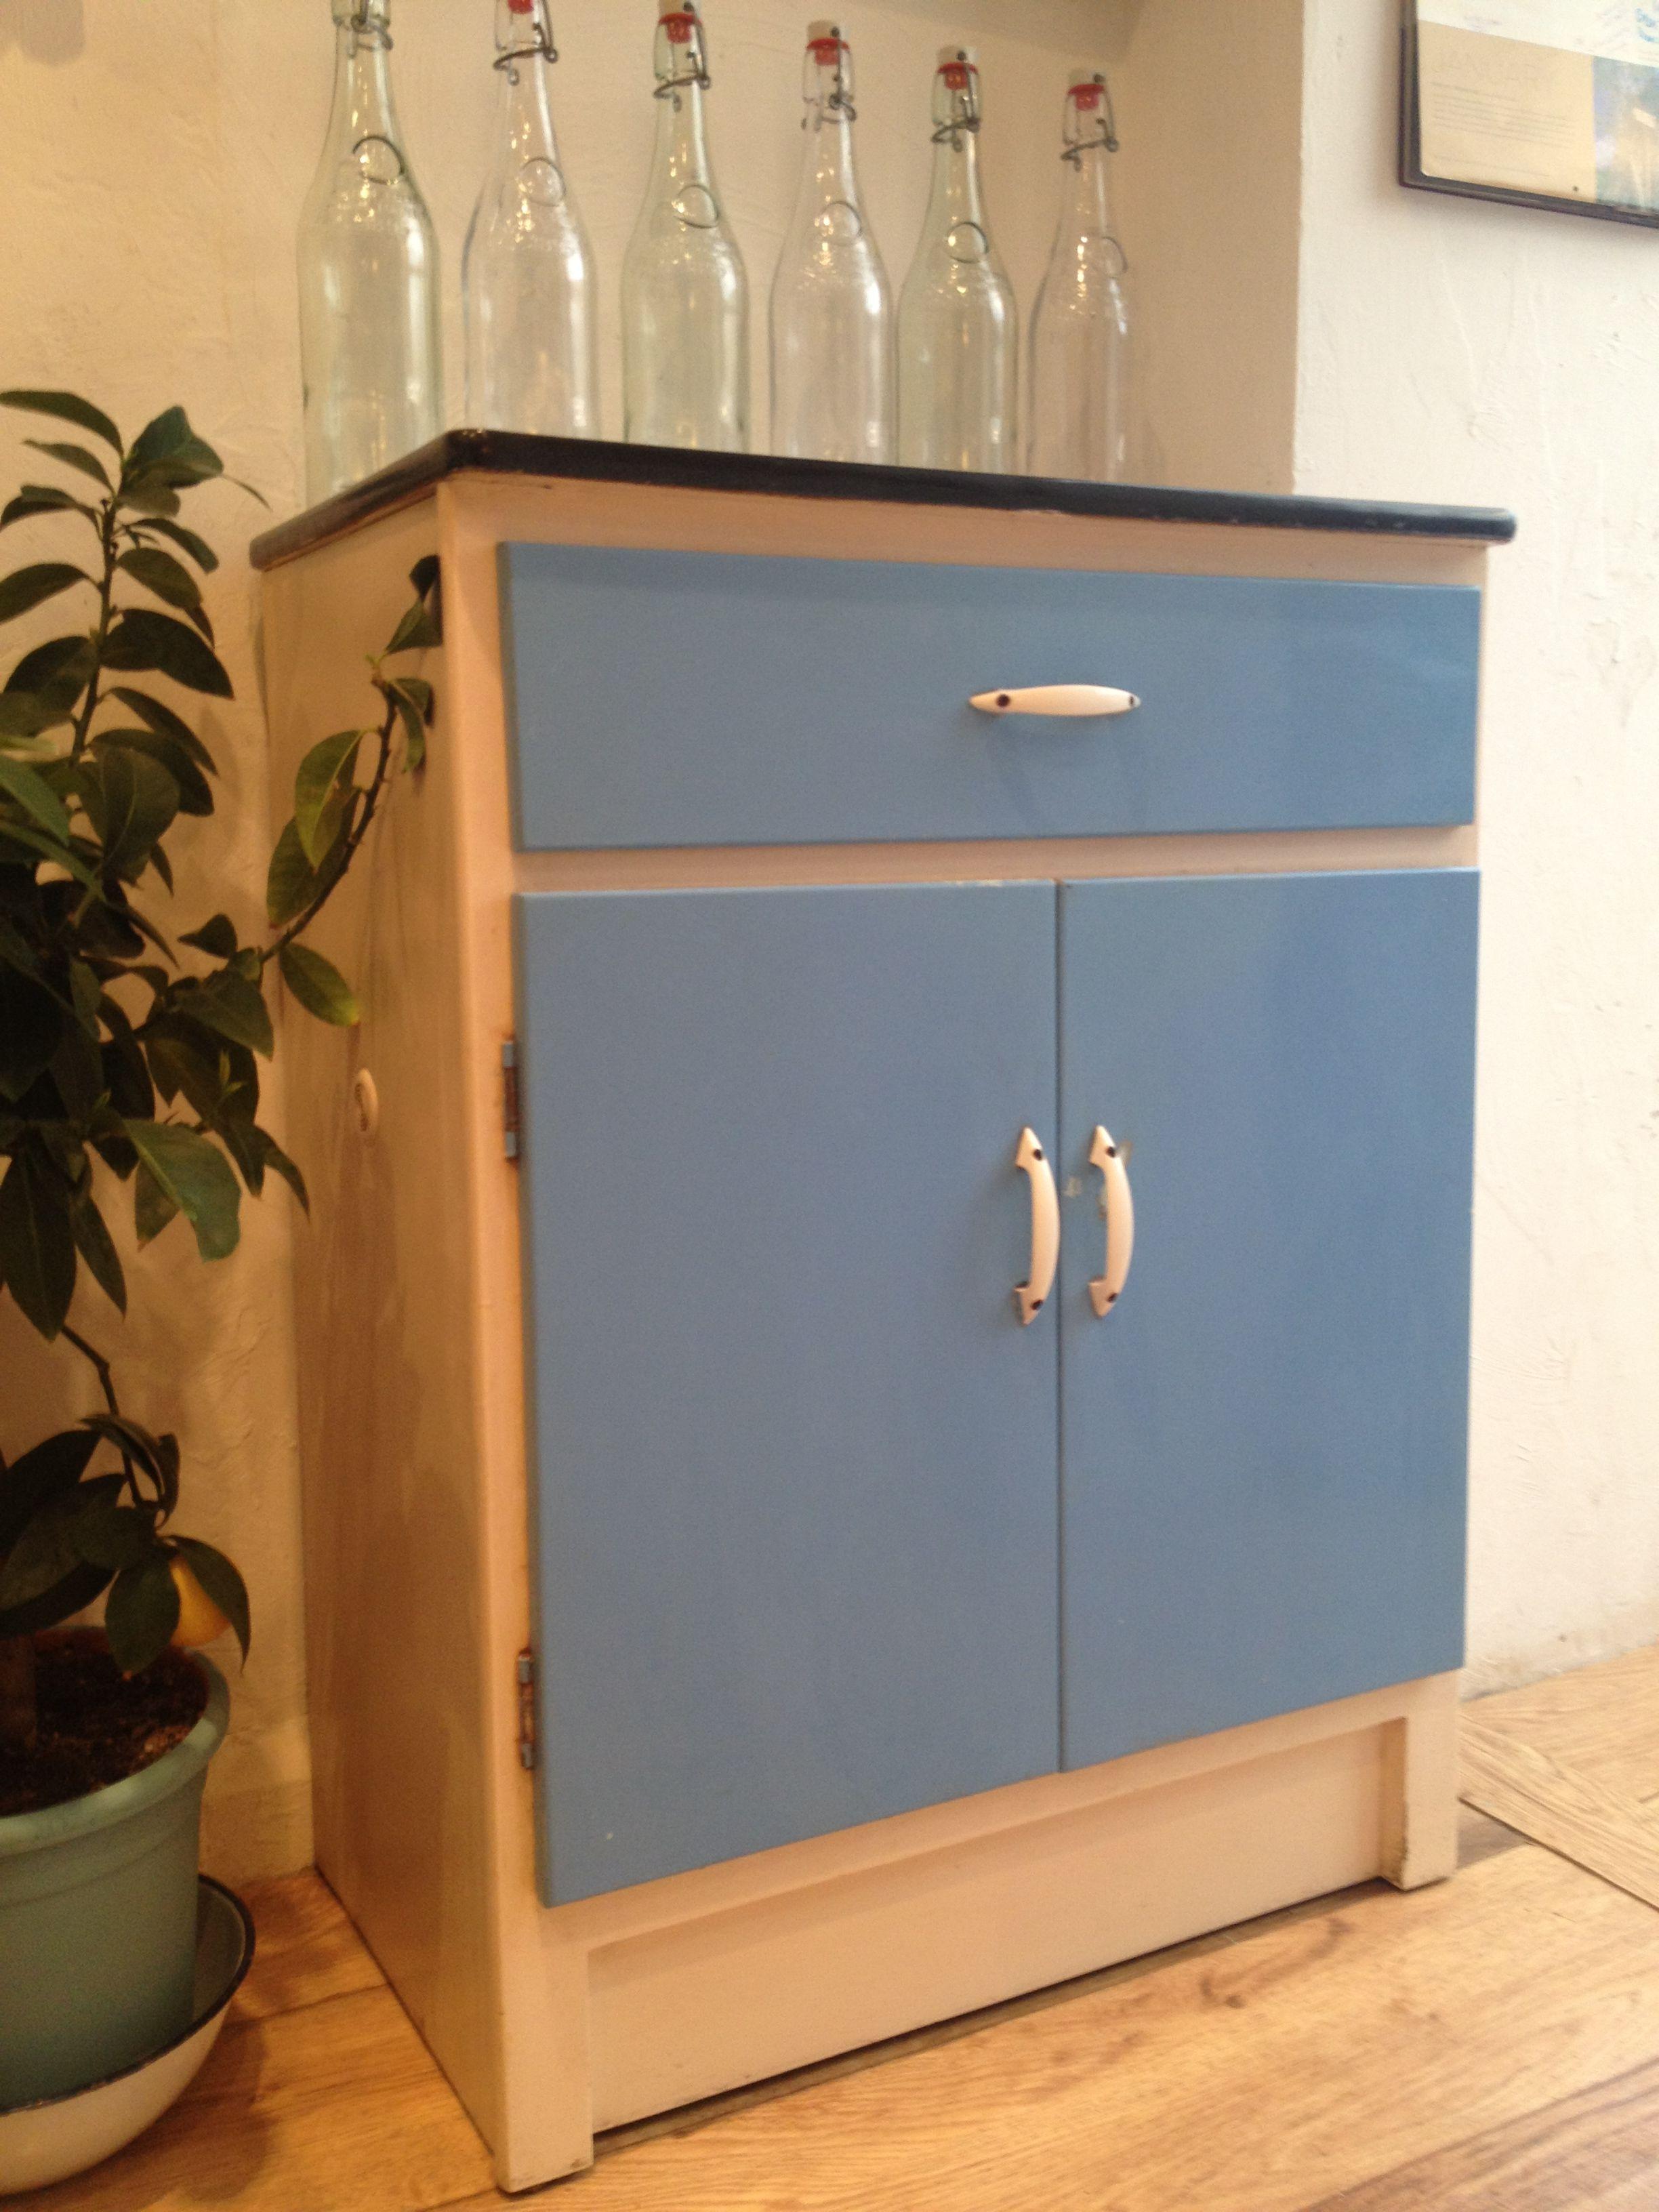 Retro 1960 S Kitchen Cupboard Original Formica Handles Black Strip And Colour 110 Please Contac Vintage Furniture For Sale Kitchen Cupboards 1960s Kitchen